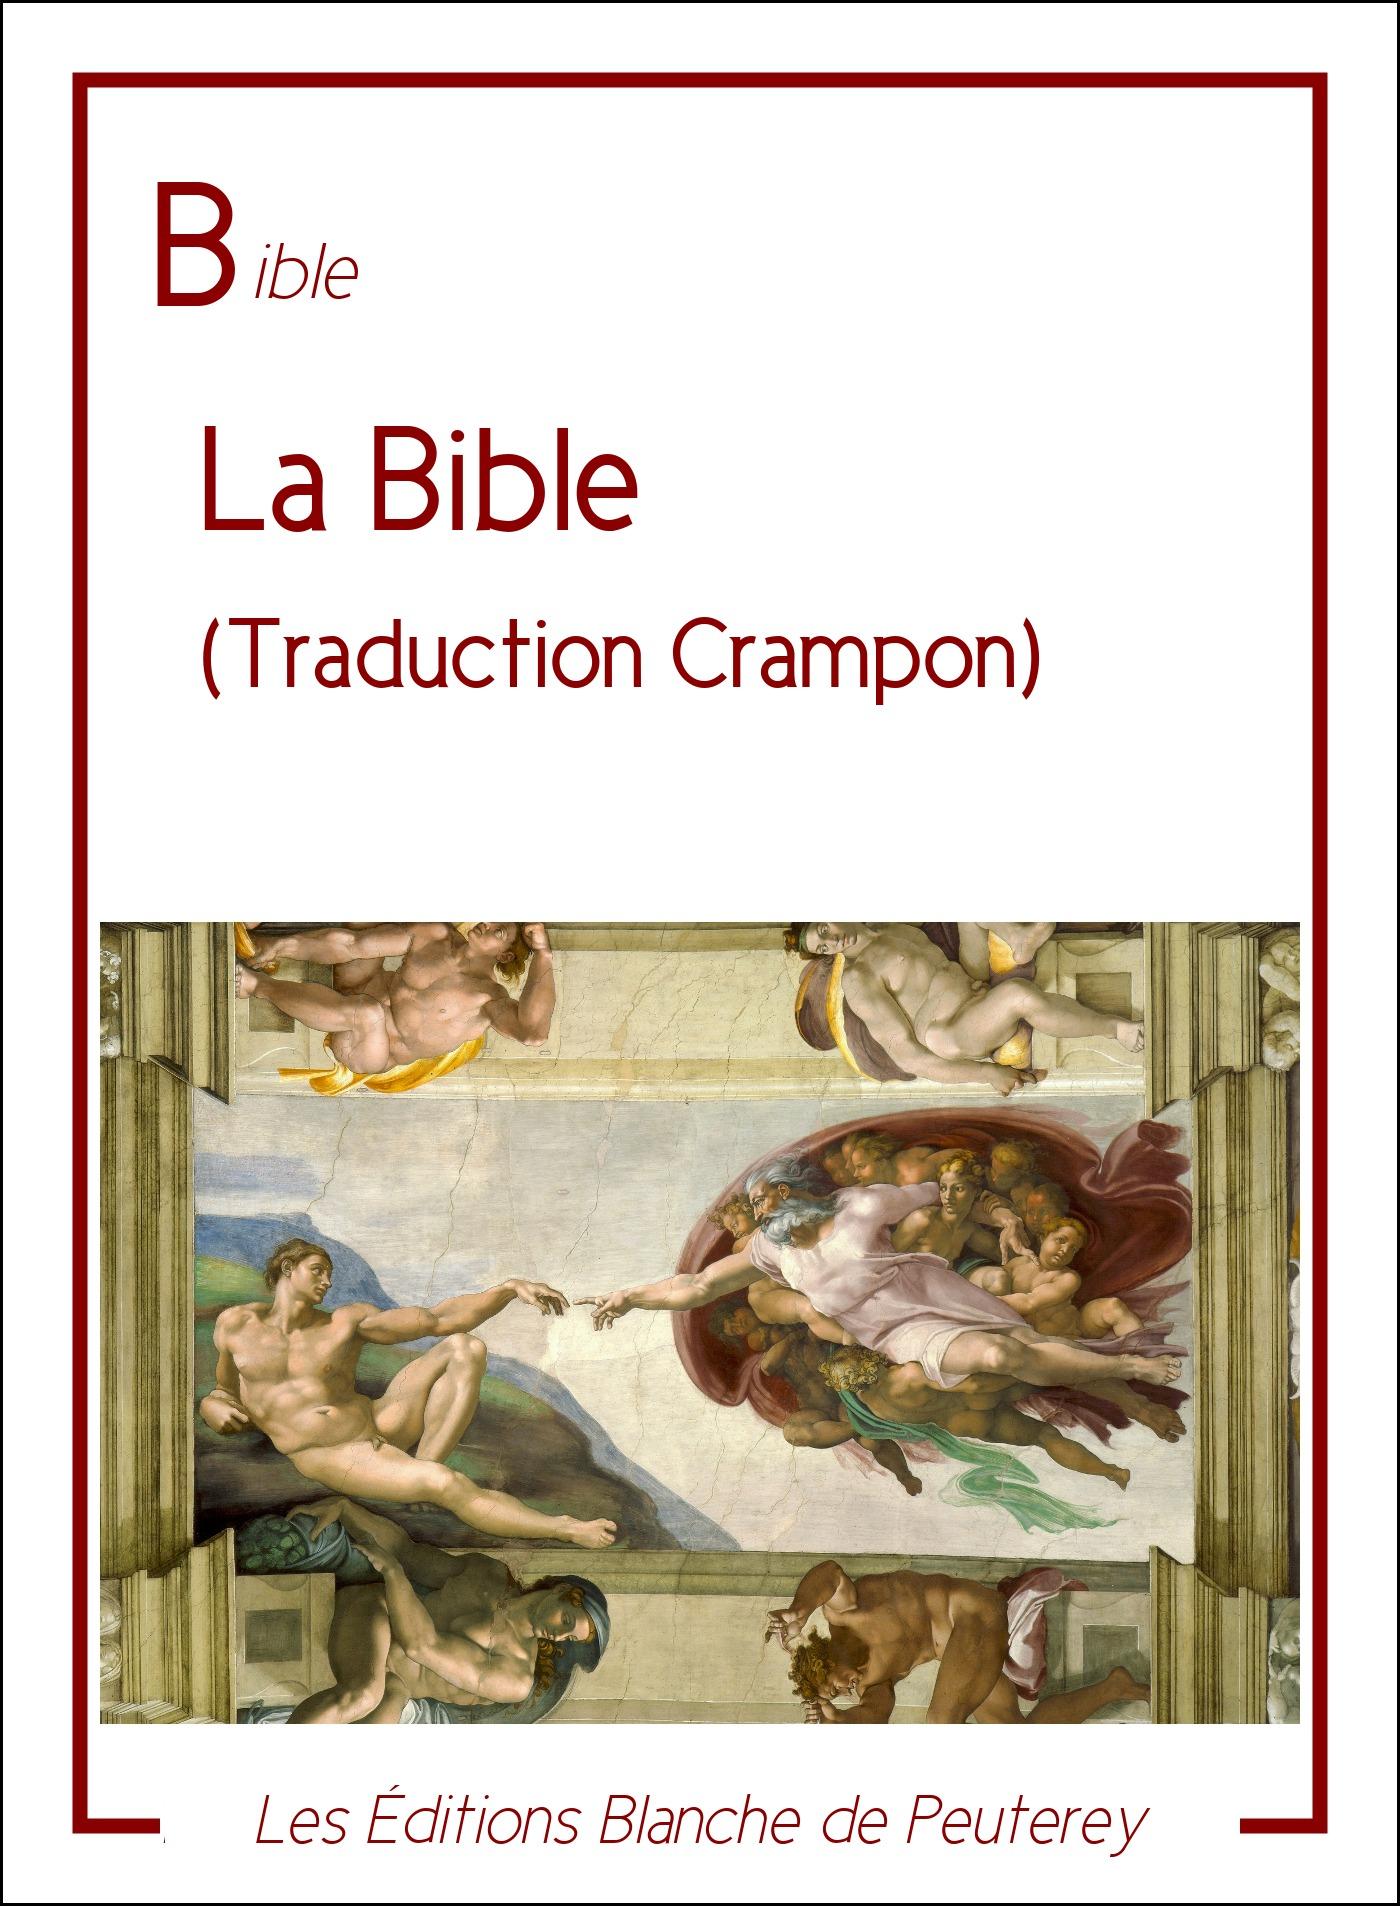 La Bible (traduction Crampon)